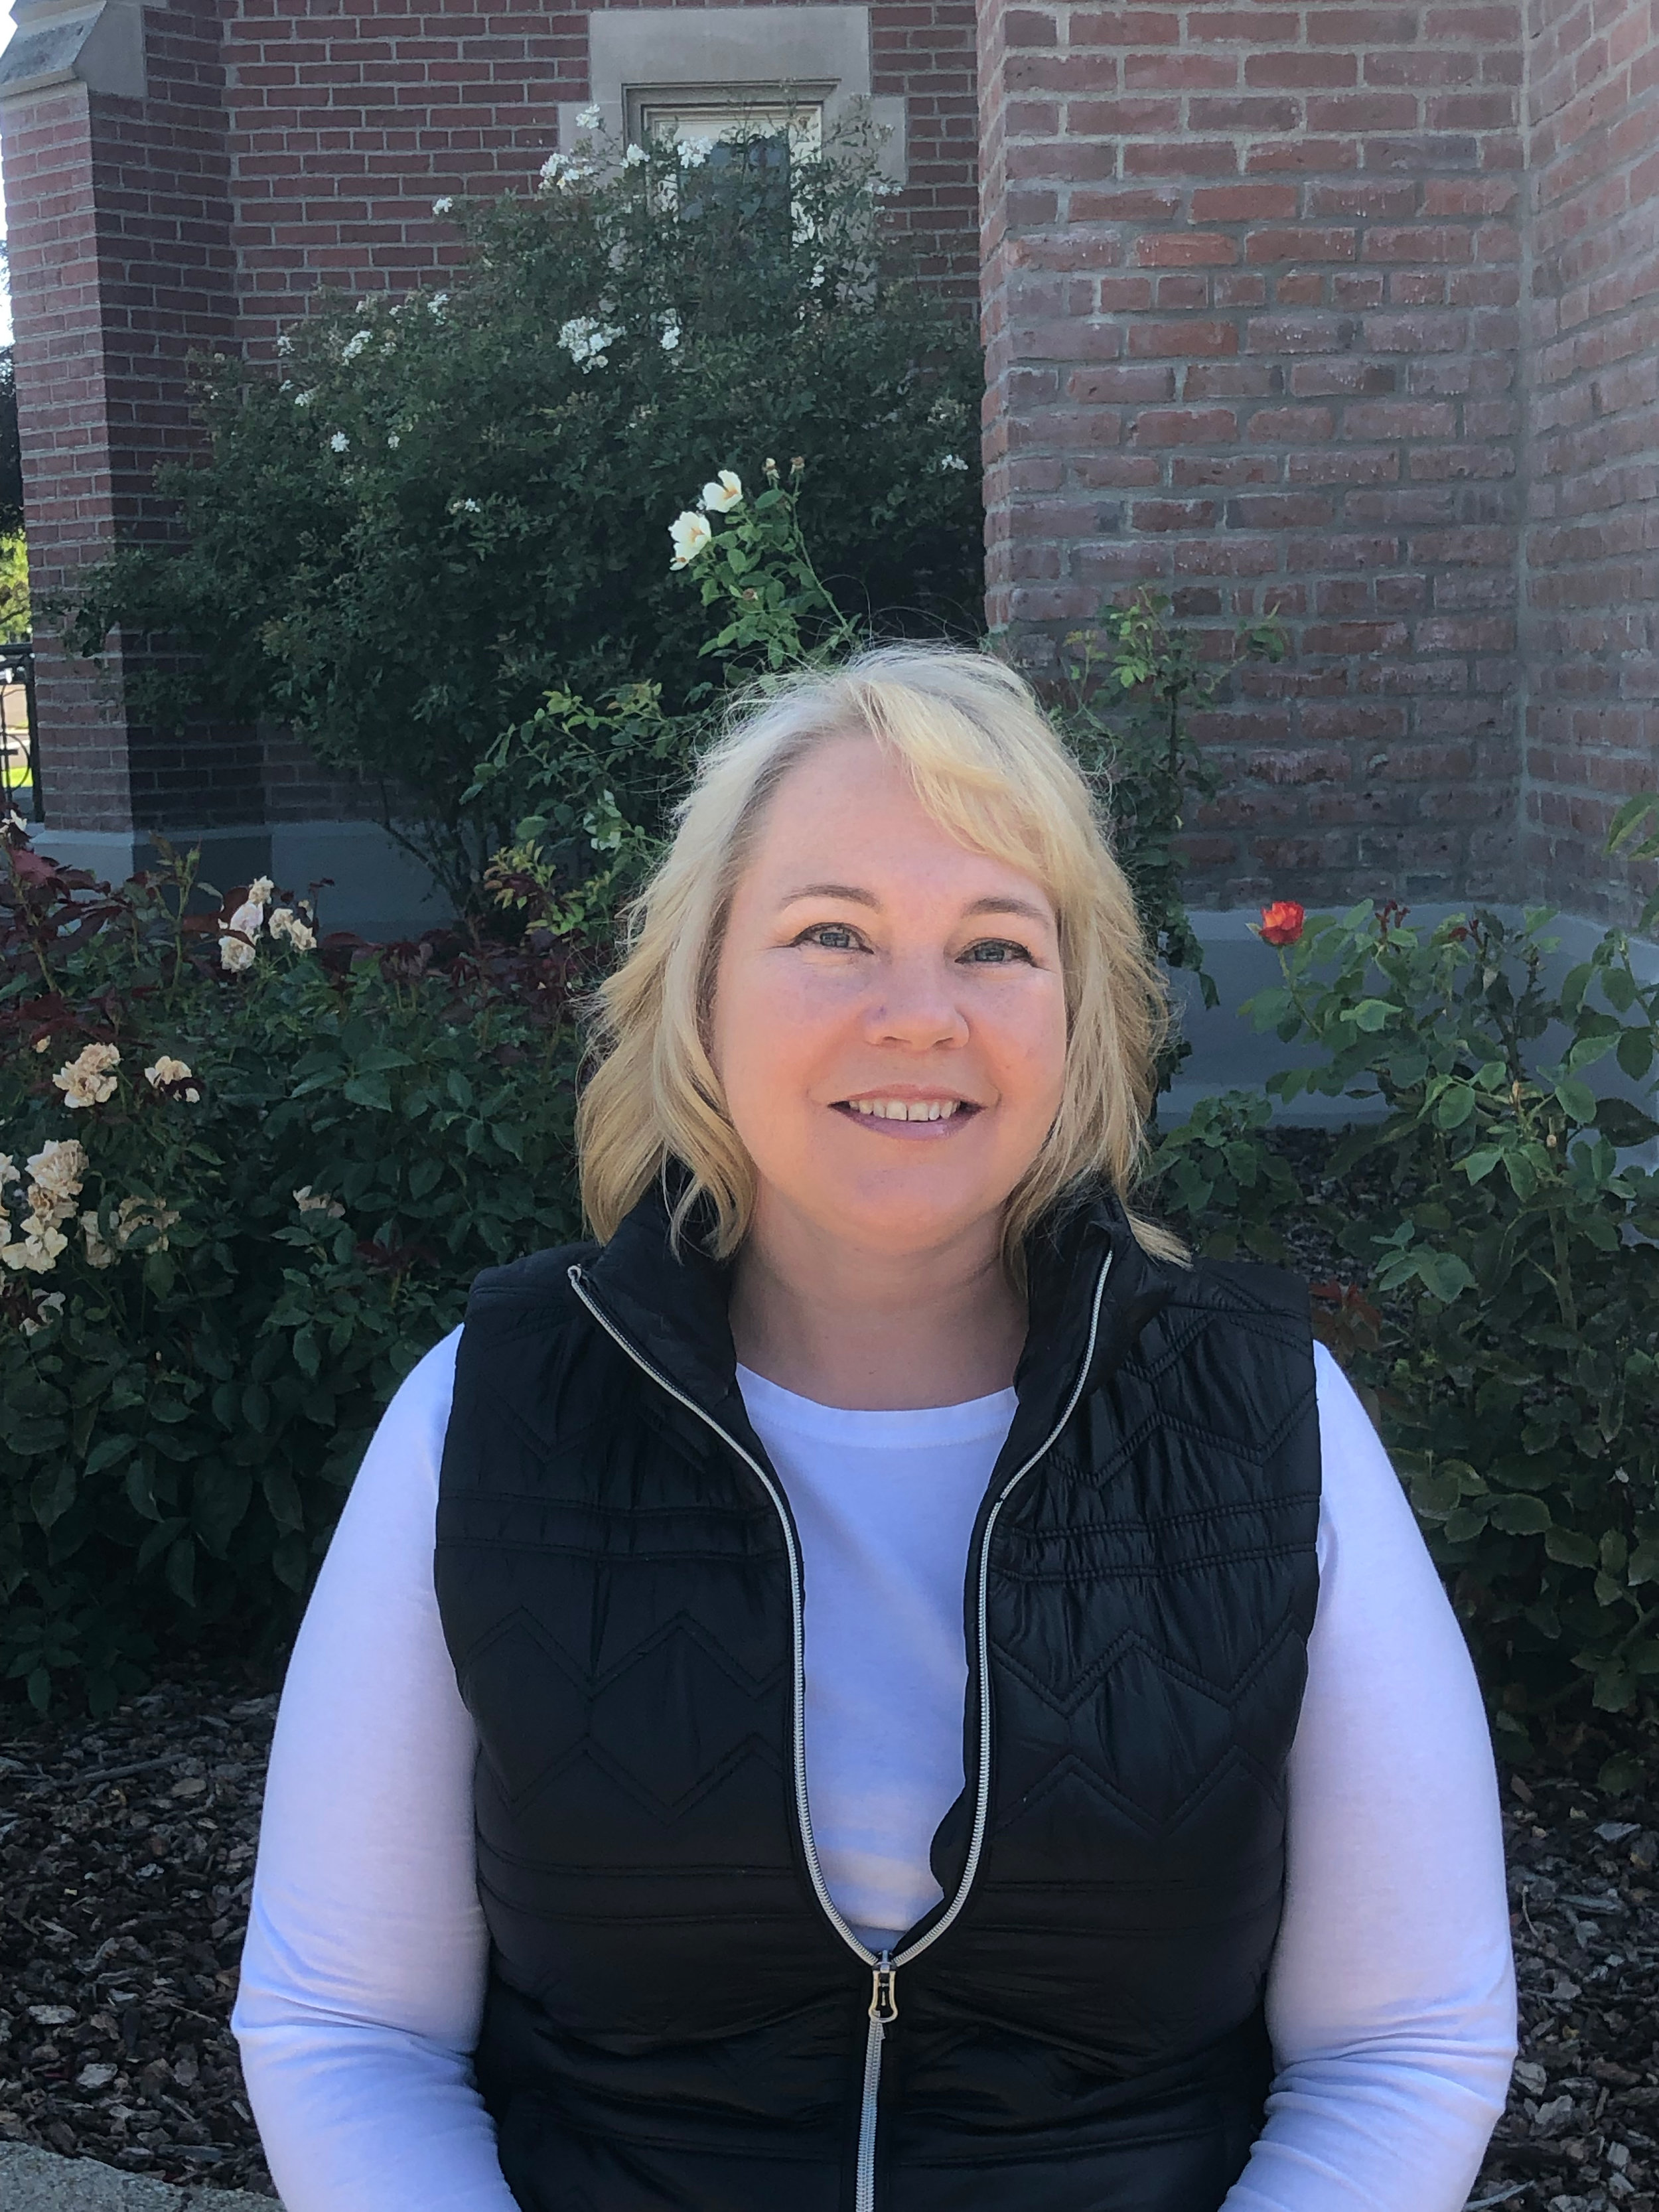 Shannon Ball  Teacher, Special Education   shannon@willowpublicschool.org